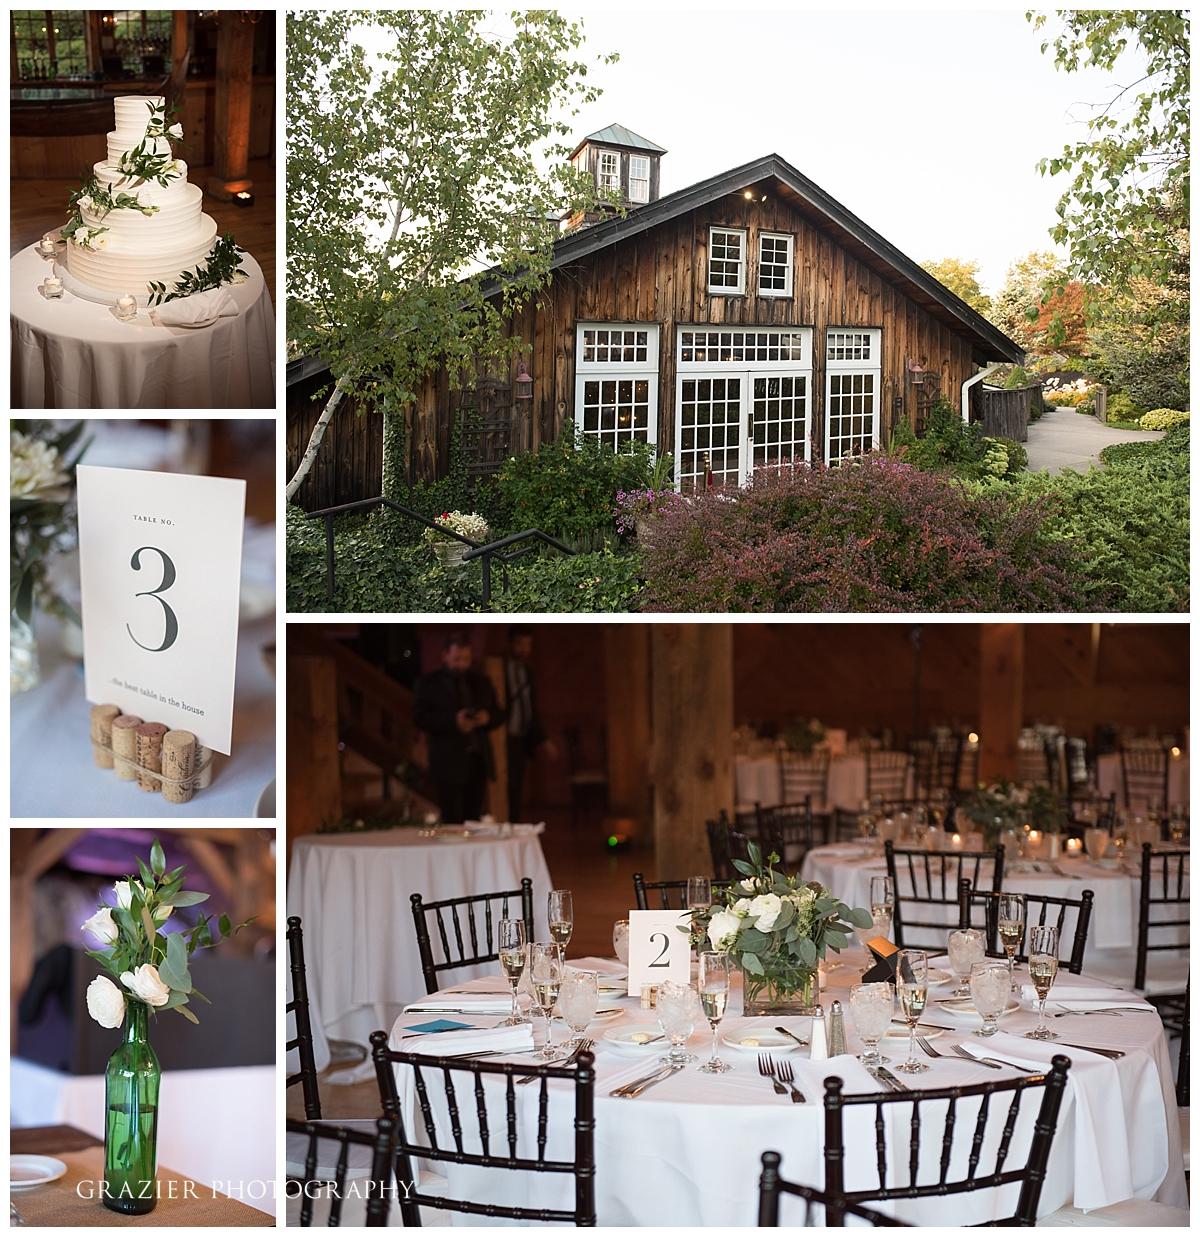 The Red Lion Inn Wedding Grazier Photography 170826-73_WEB.jpg